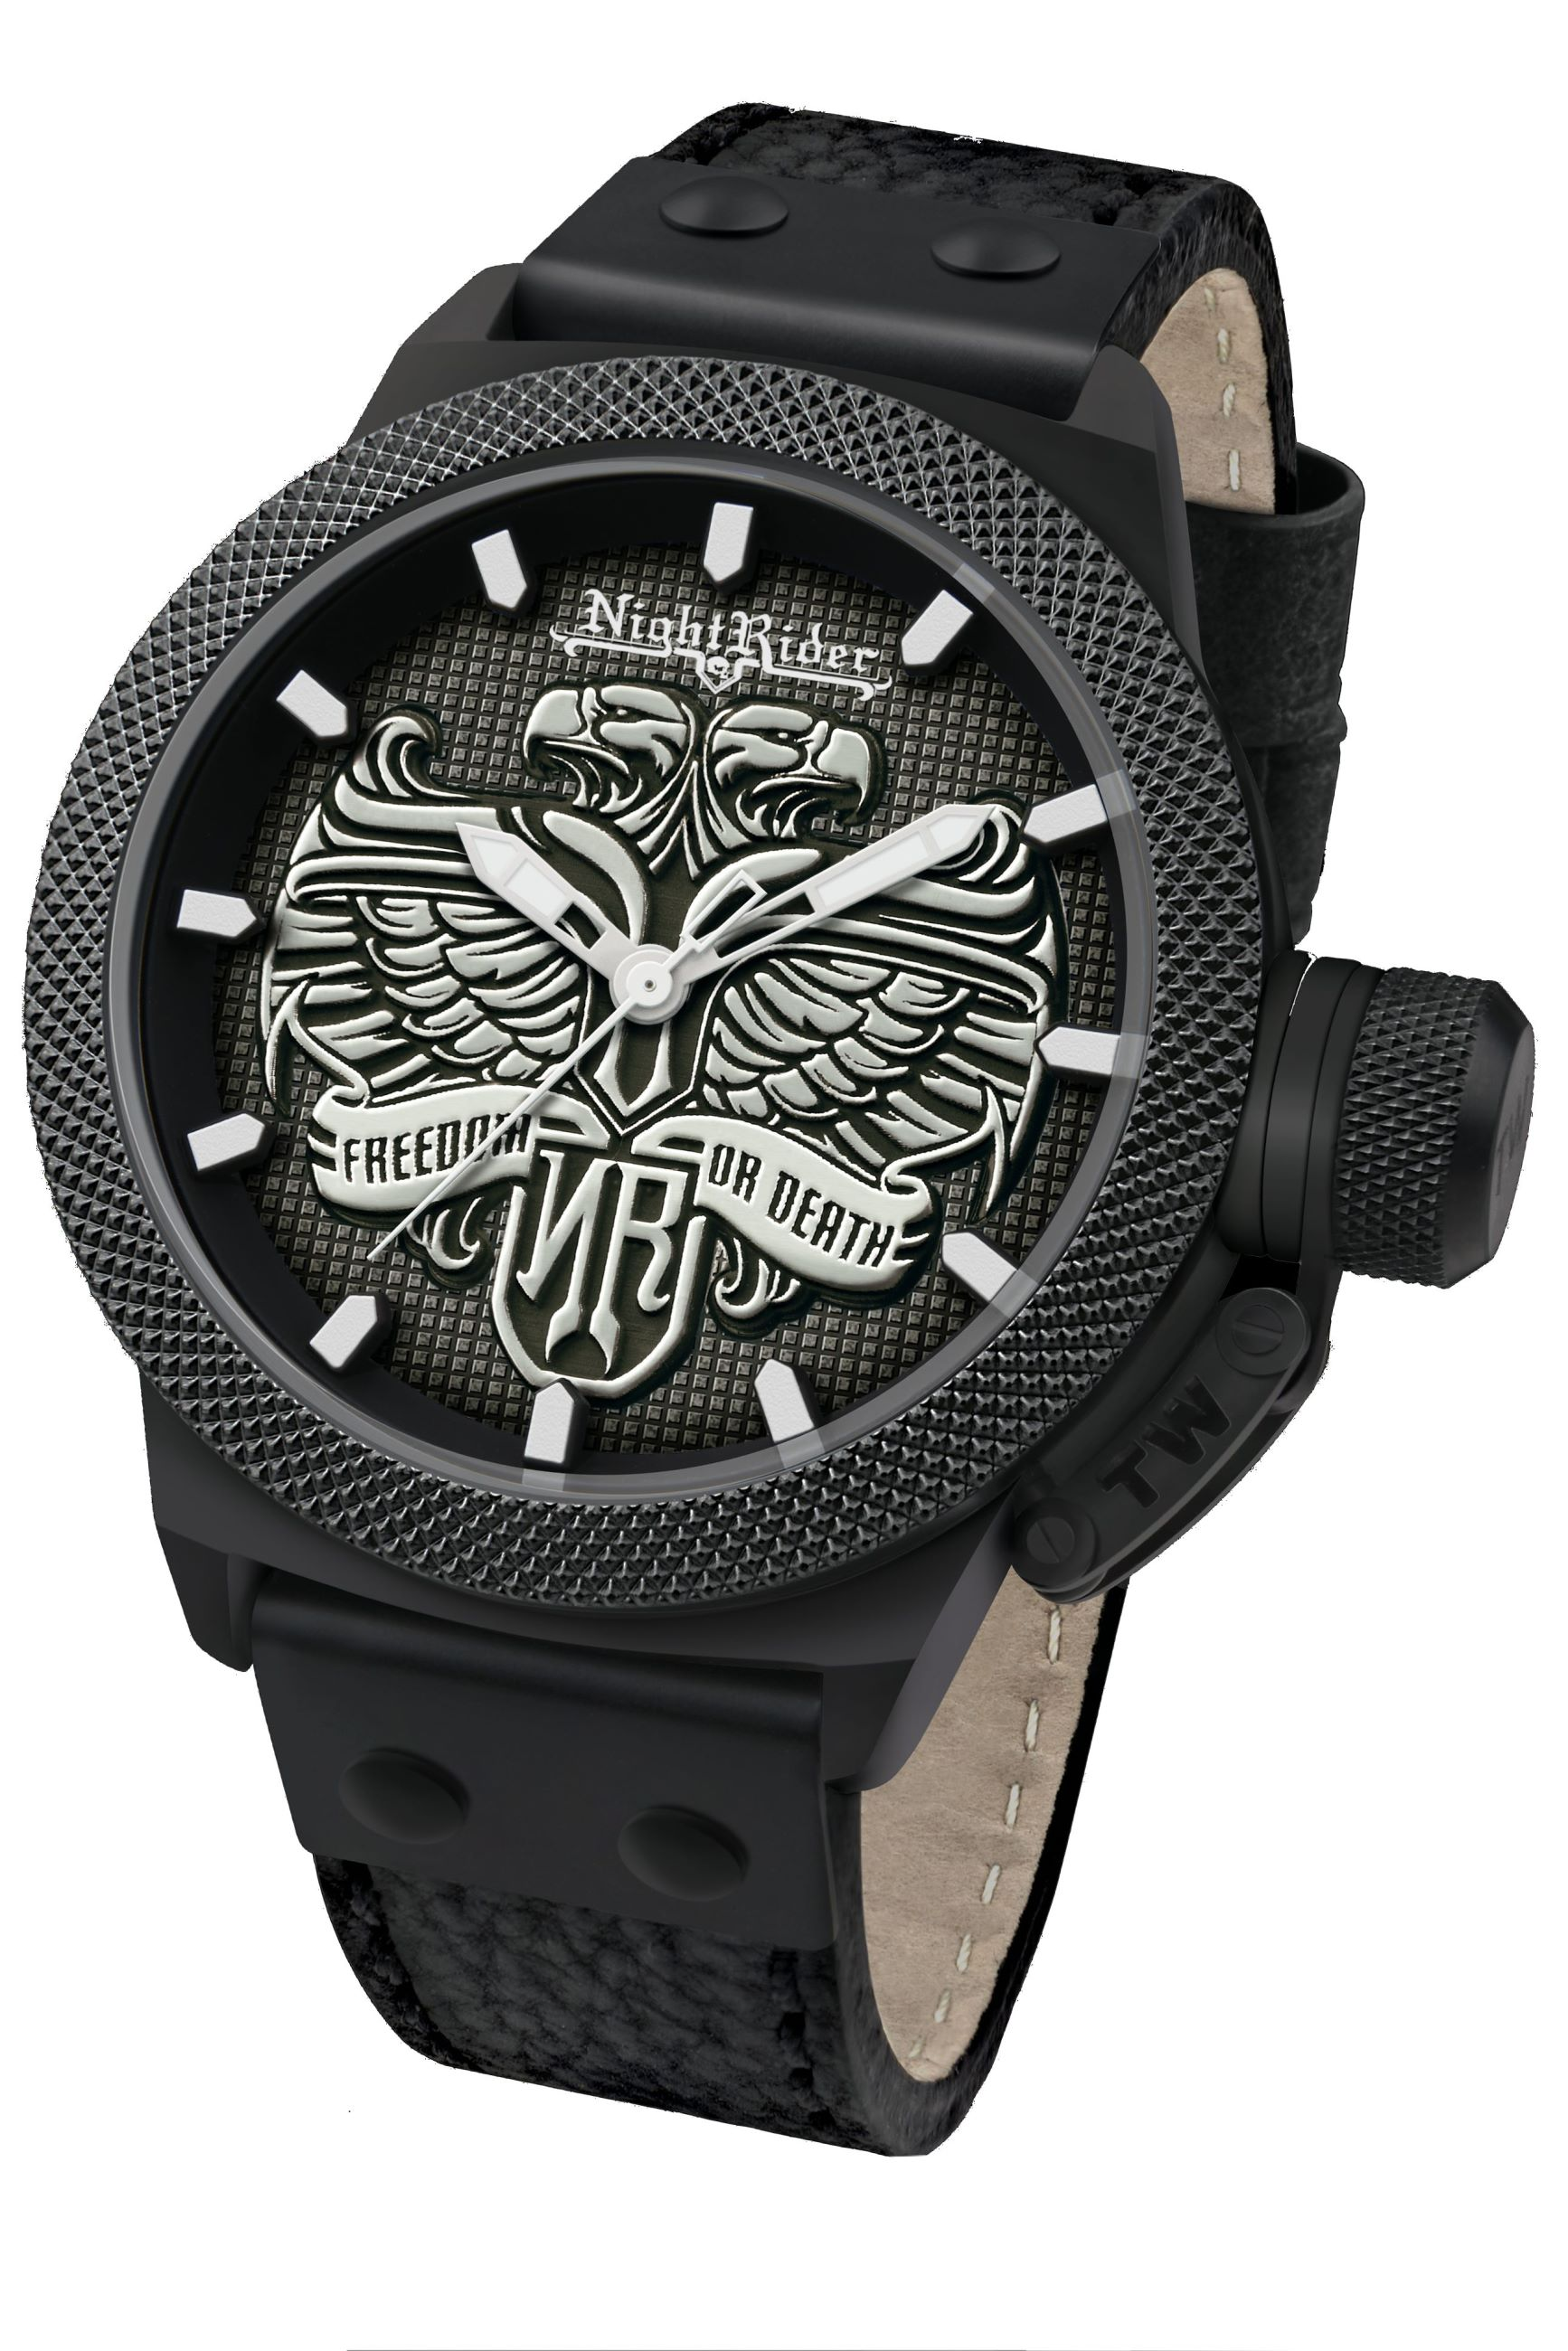 TW STEEL -Night Rider Special Edition Armbanduhr Nr. 3